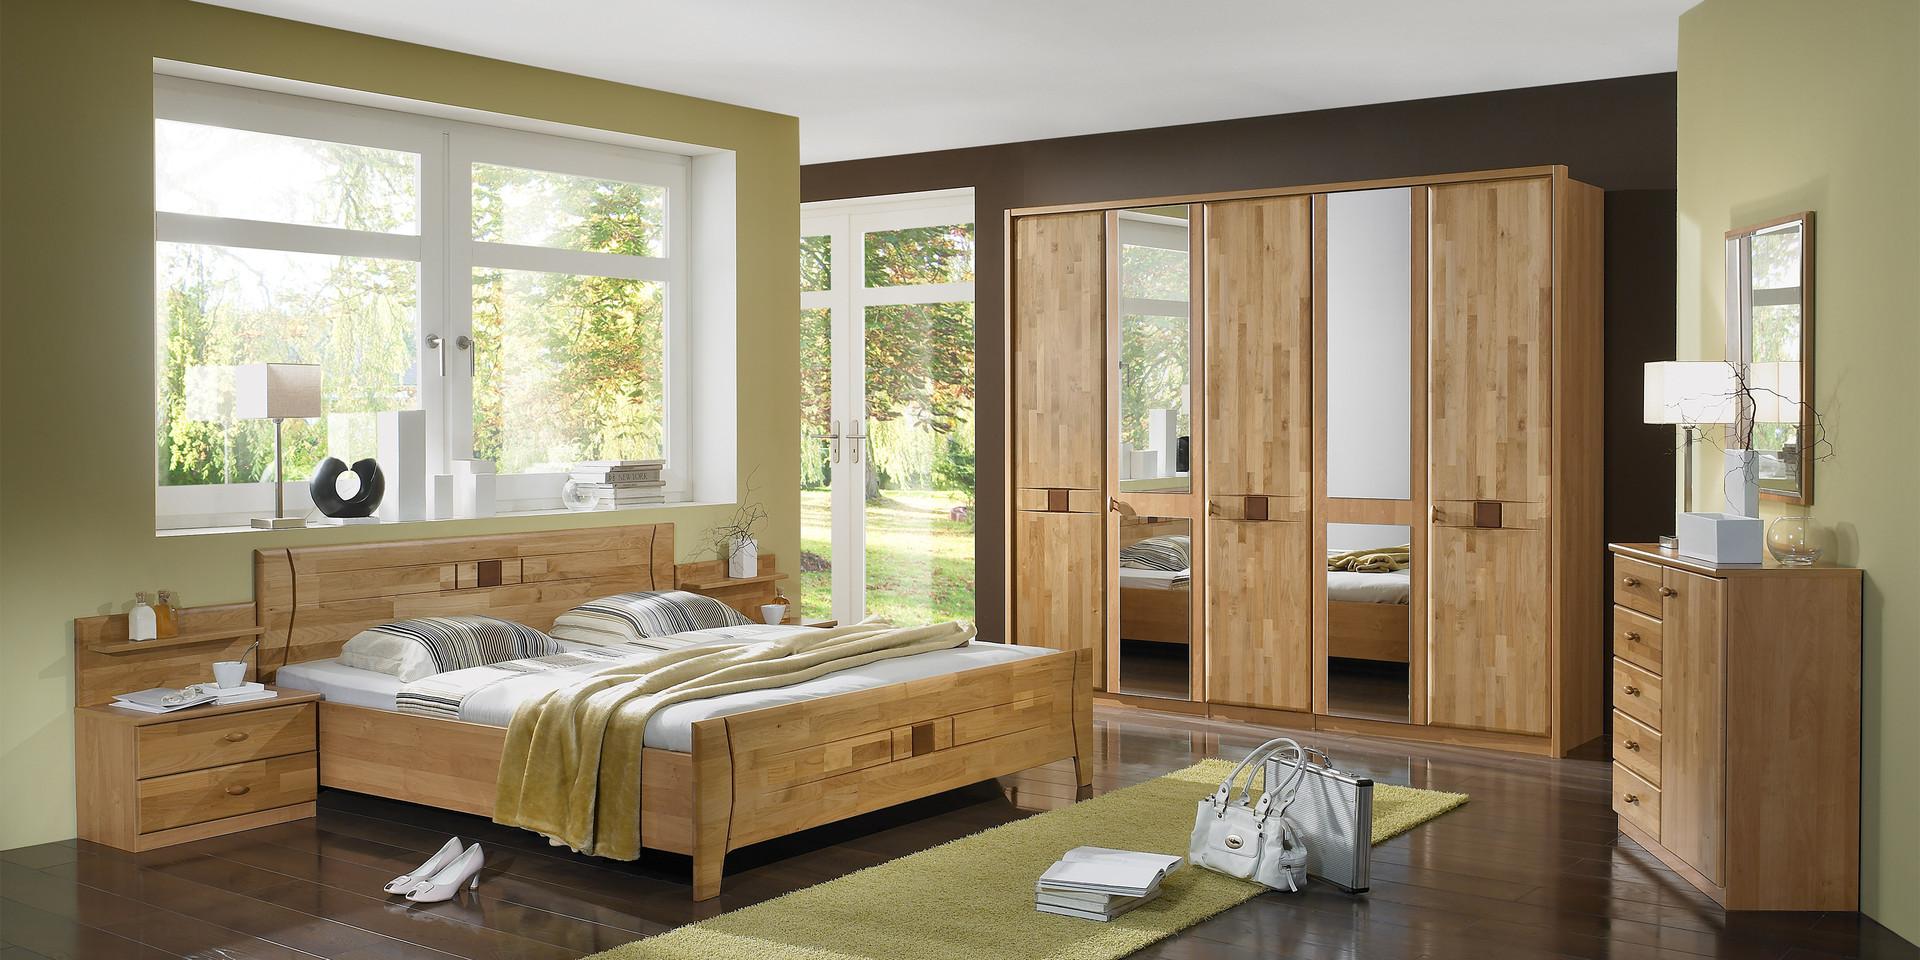 nice schlafzimmer hersteller produktsuche images schlafzimmer hersteller produktsuche funvit. Black Bedroom Furniture Sets. Home Design Ideas